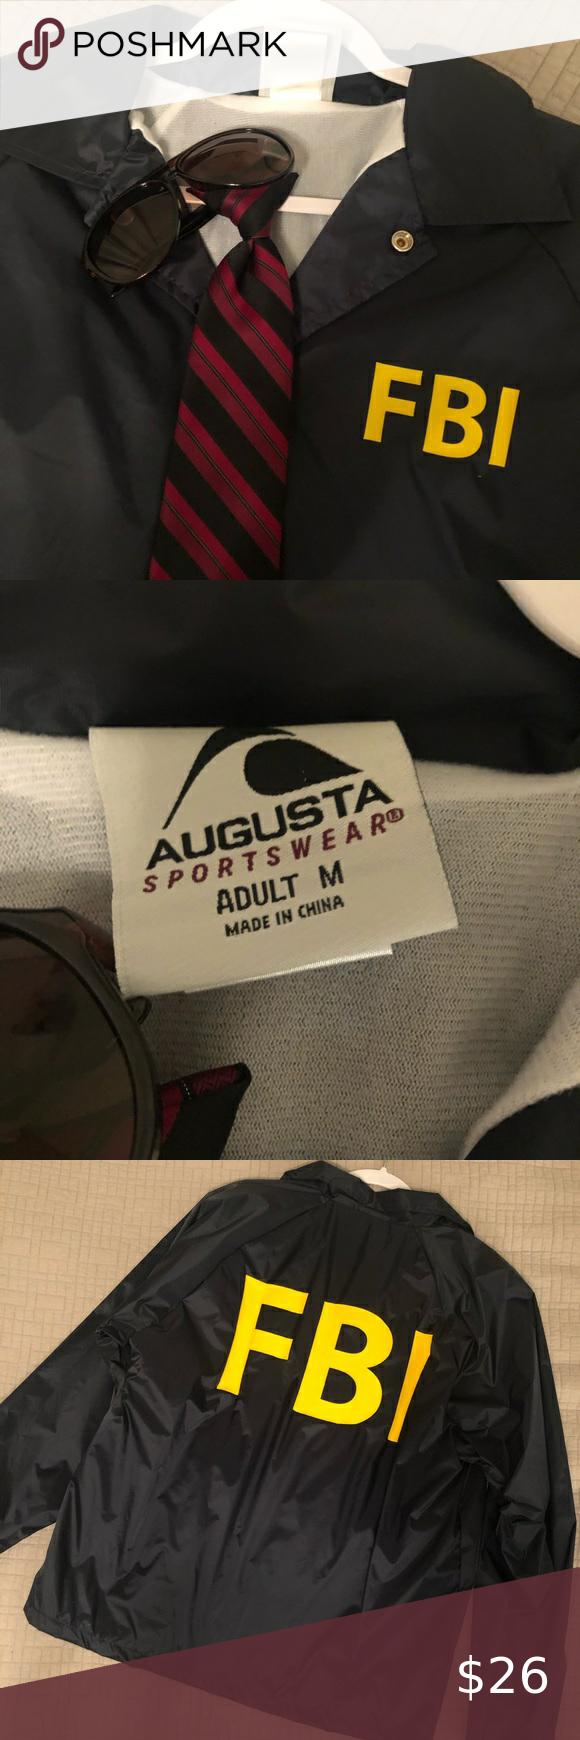 Burt Macklin Costume Burt Macklin Costume Dark Aviator Sunglasses Augusta Sportswear